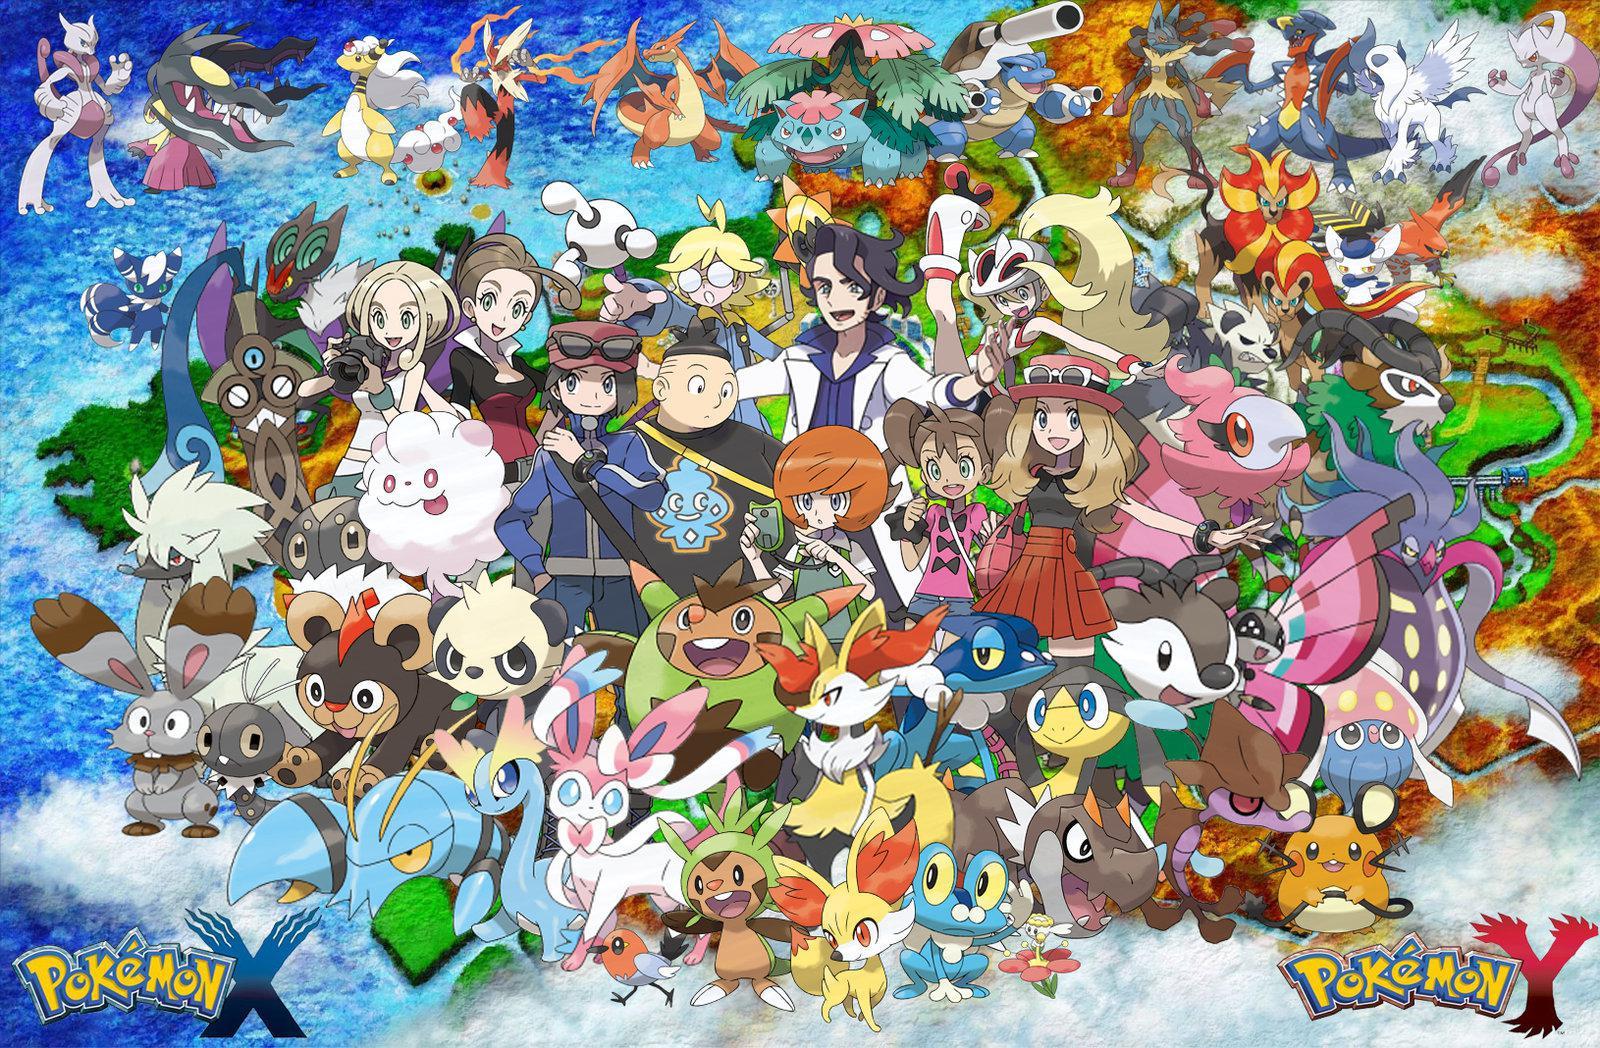 Pokmon X [3DS] Part 1 A New Adventure Begins 12Dimension 1600x1048